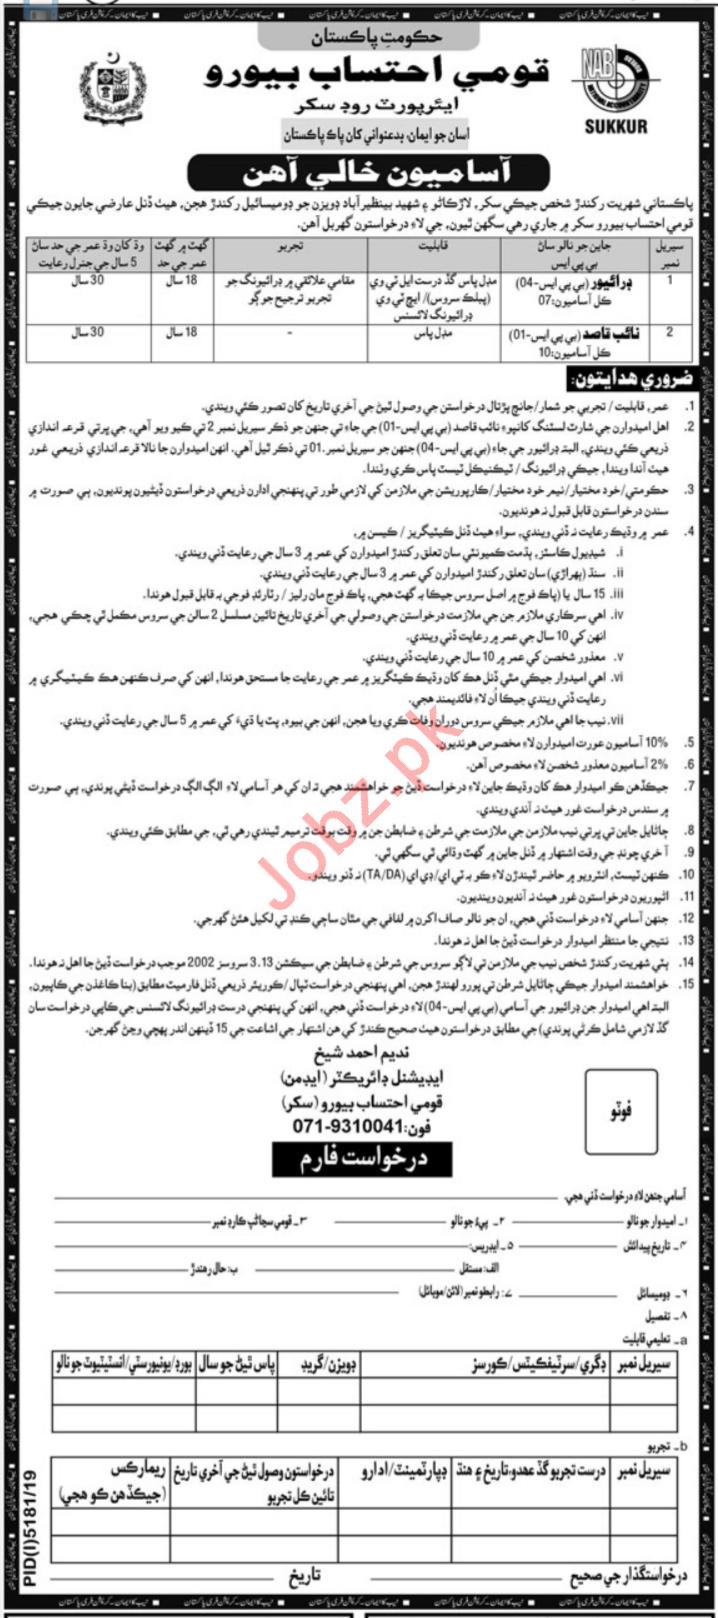 National Accountability Bureau NAB Jobs 2020 in Sukkur